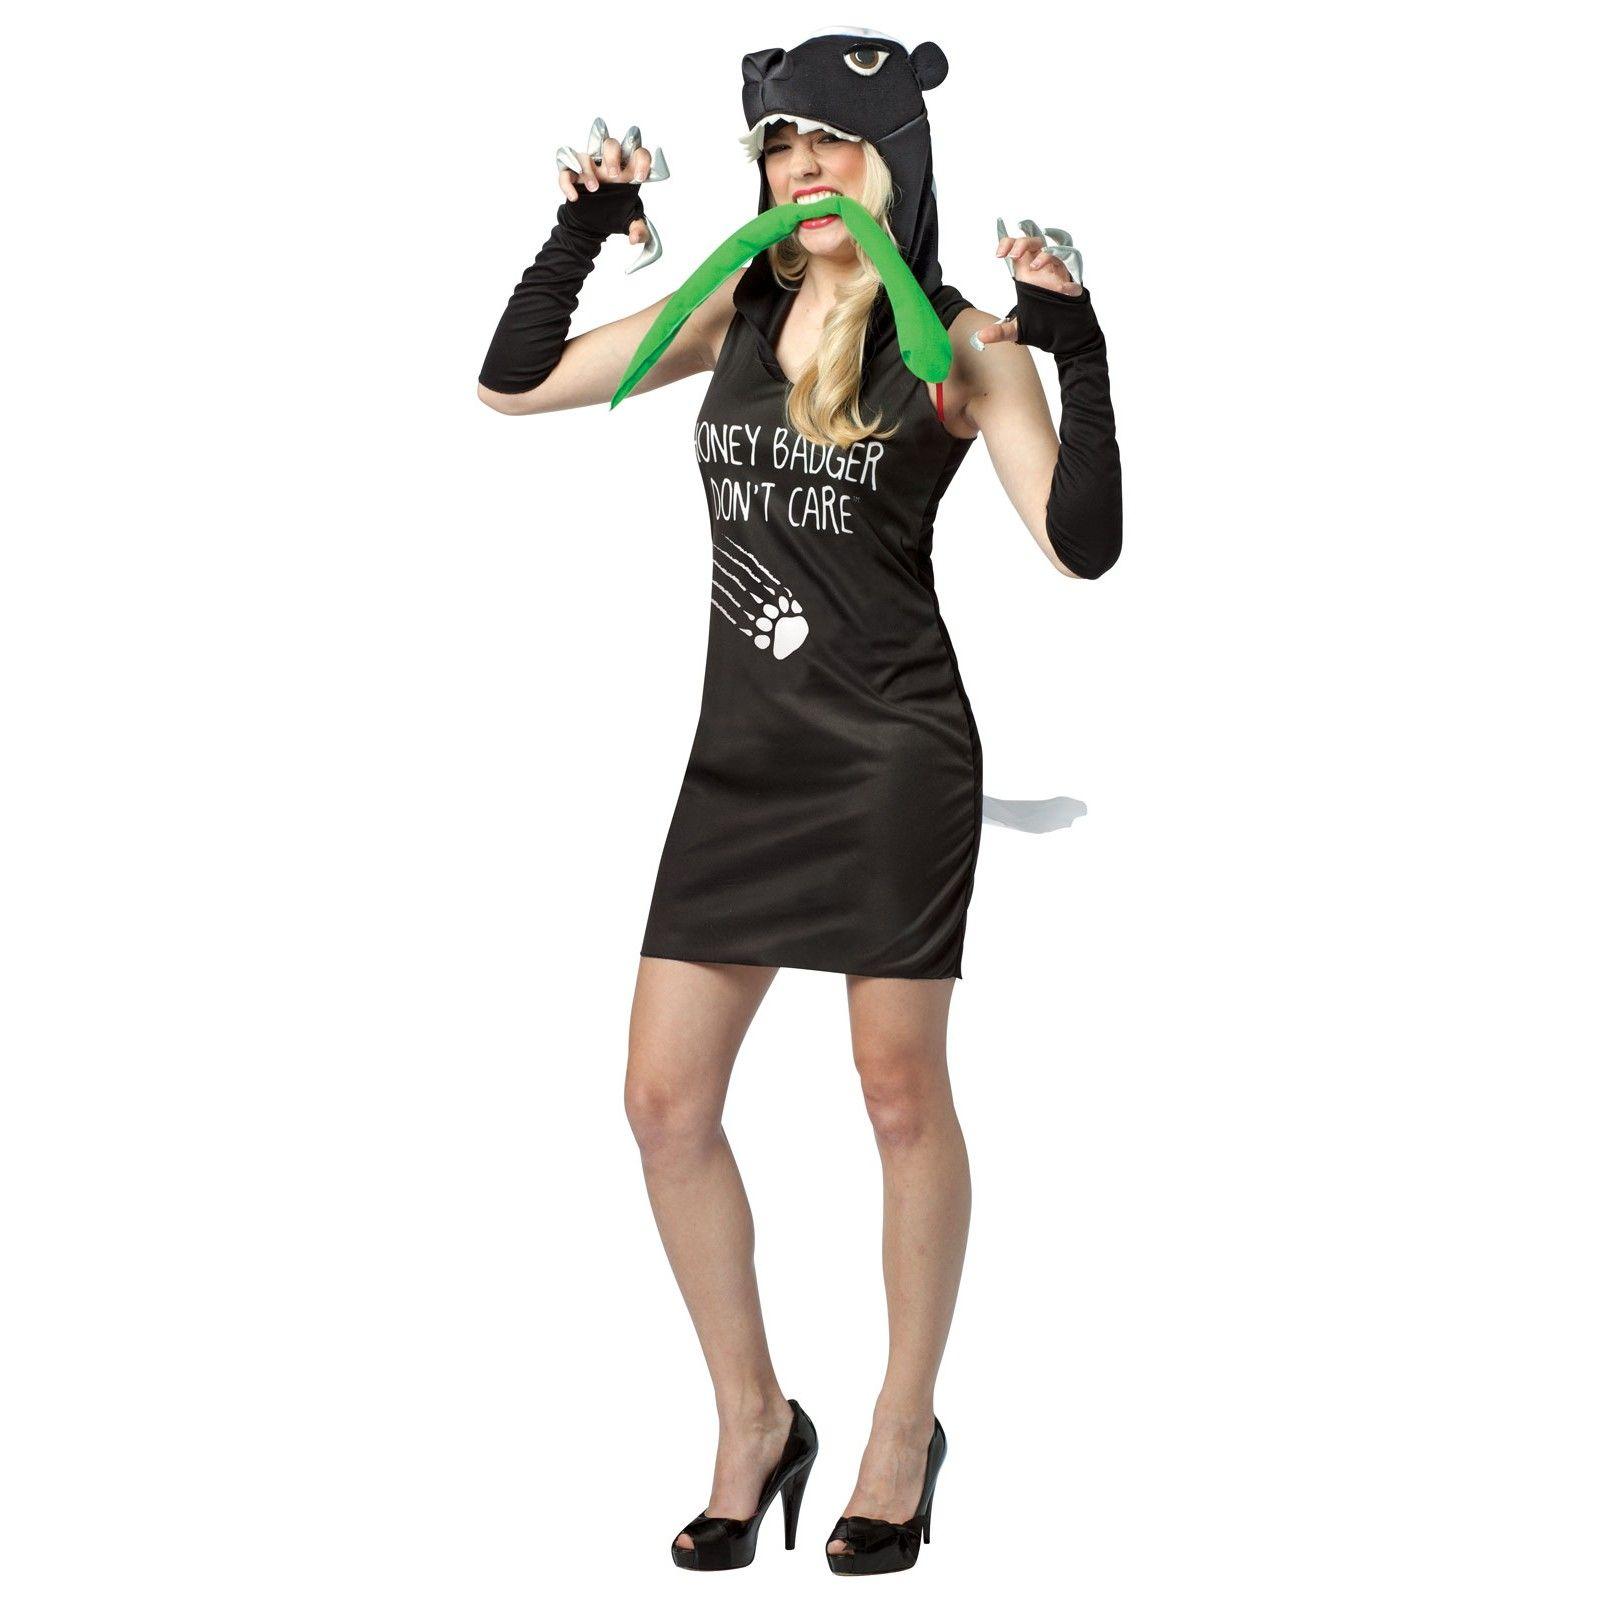 Werewolf Teen Girl Costume   Honey badger, Costumes and Halloween ...